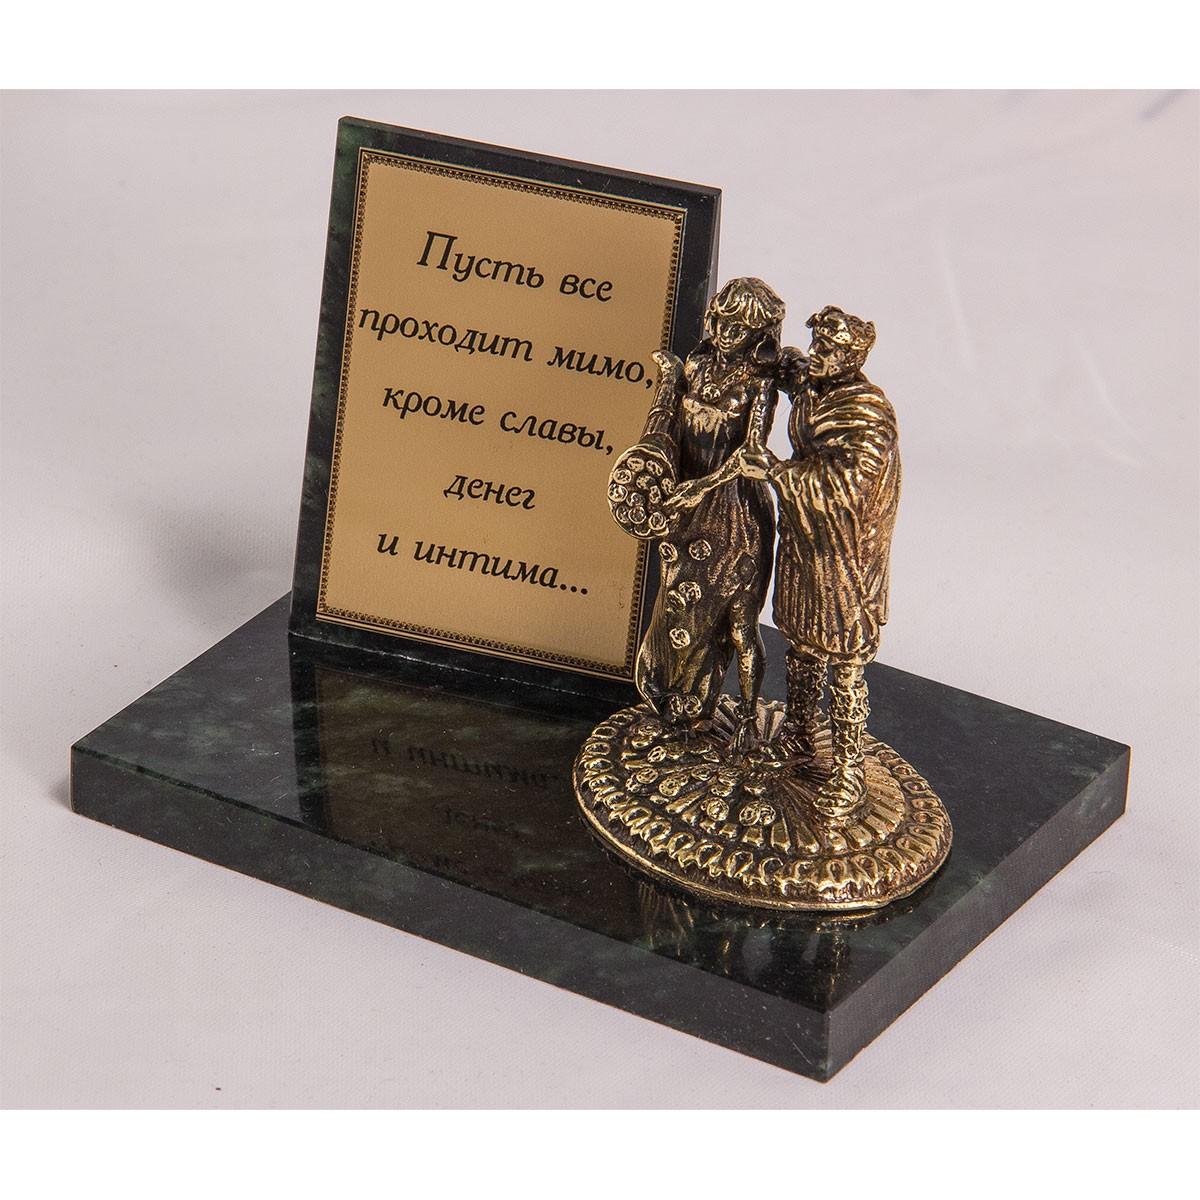 Фигурка на камне «Пожелание другу»